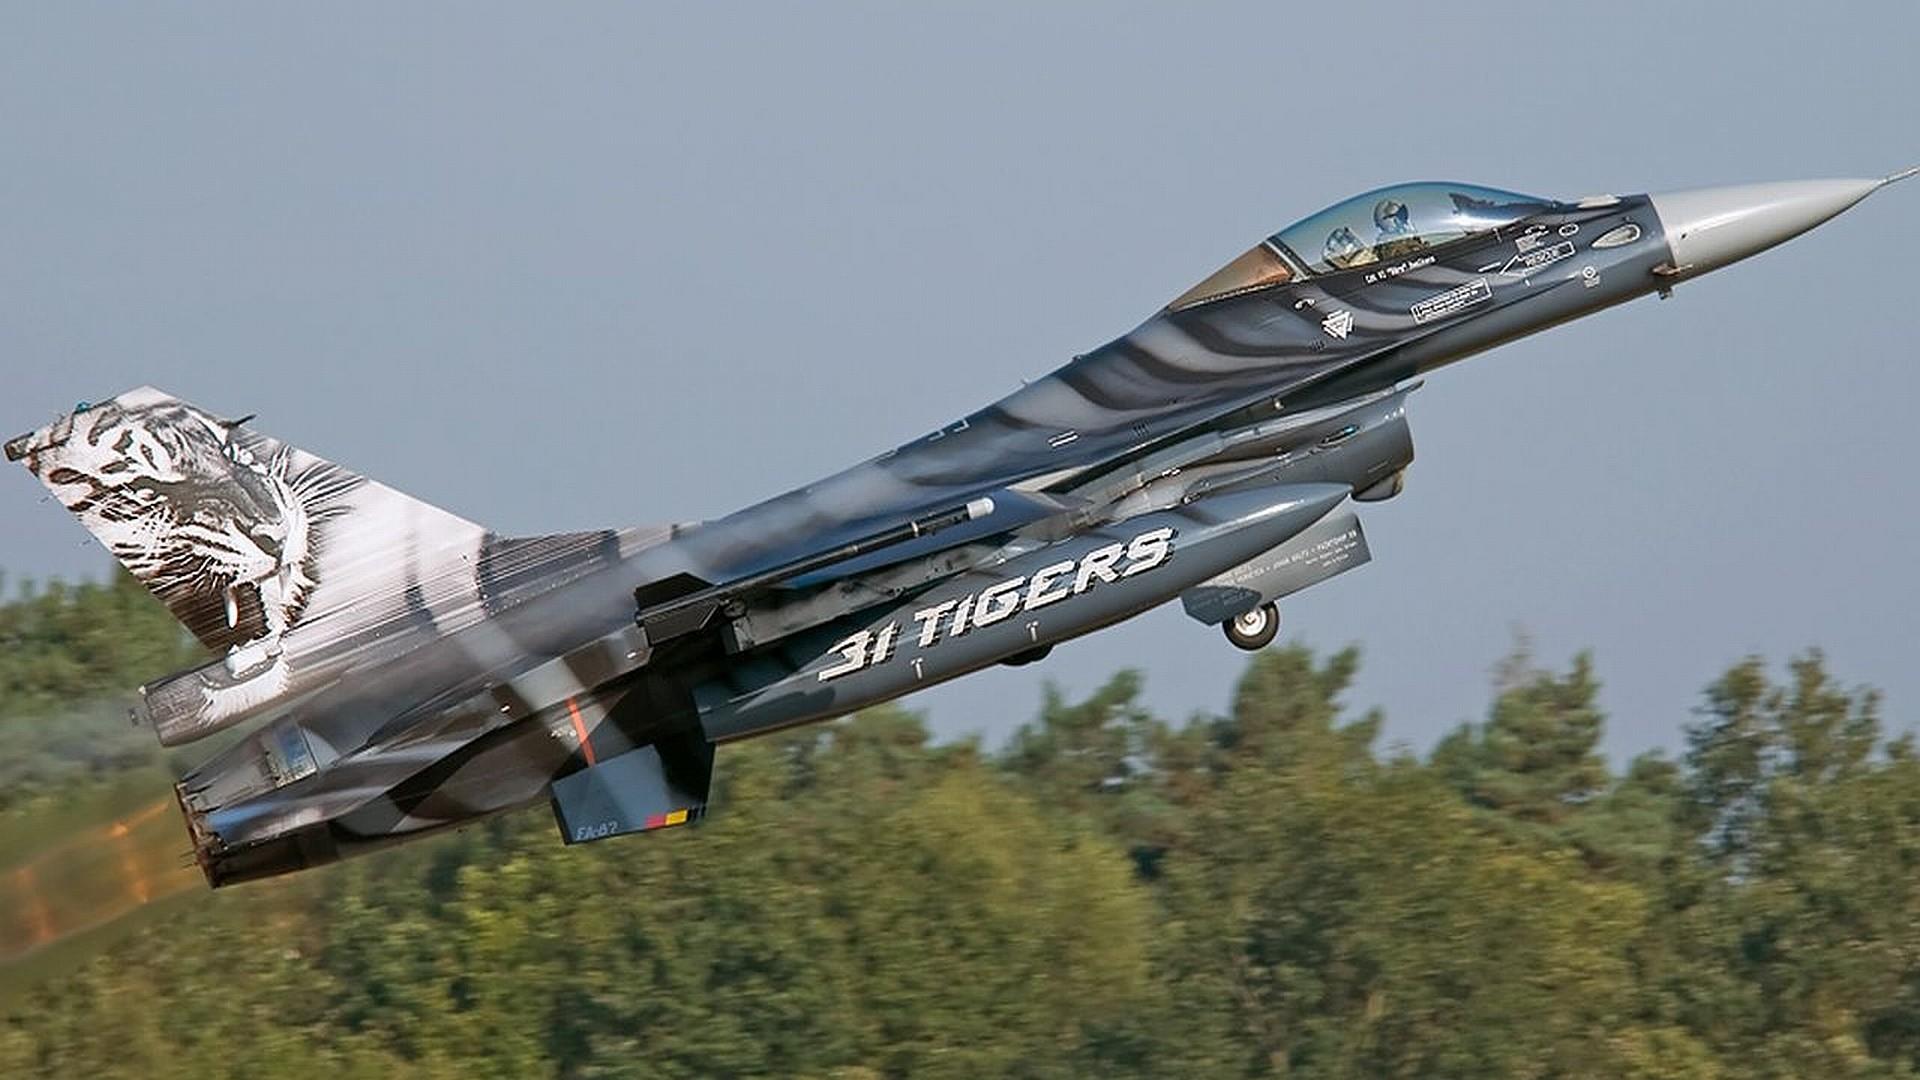 General Dynamics F-16 Fighting Falcon hd